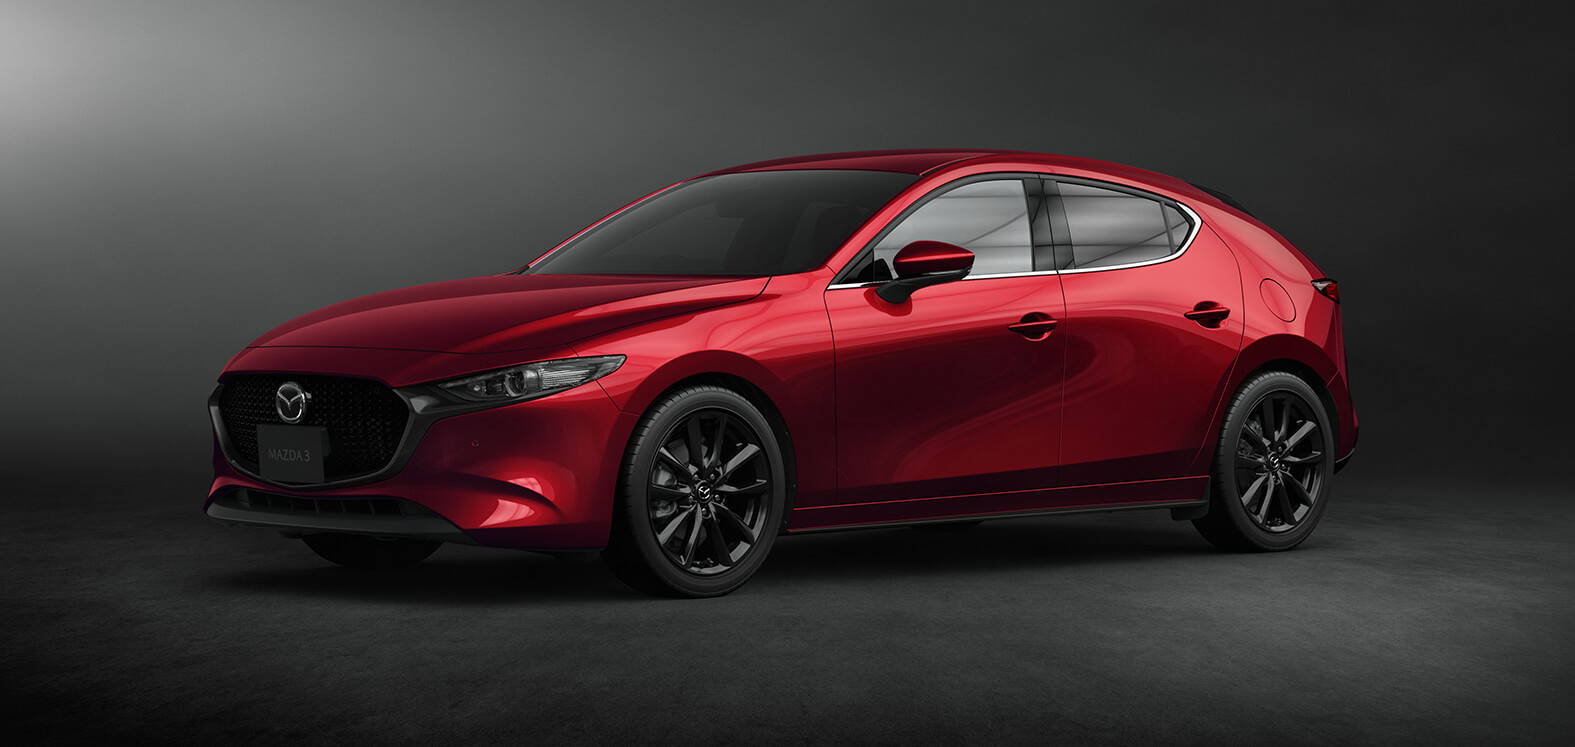 Mazda_3_6BA-BP5P_front_side